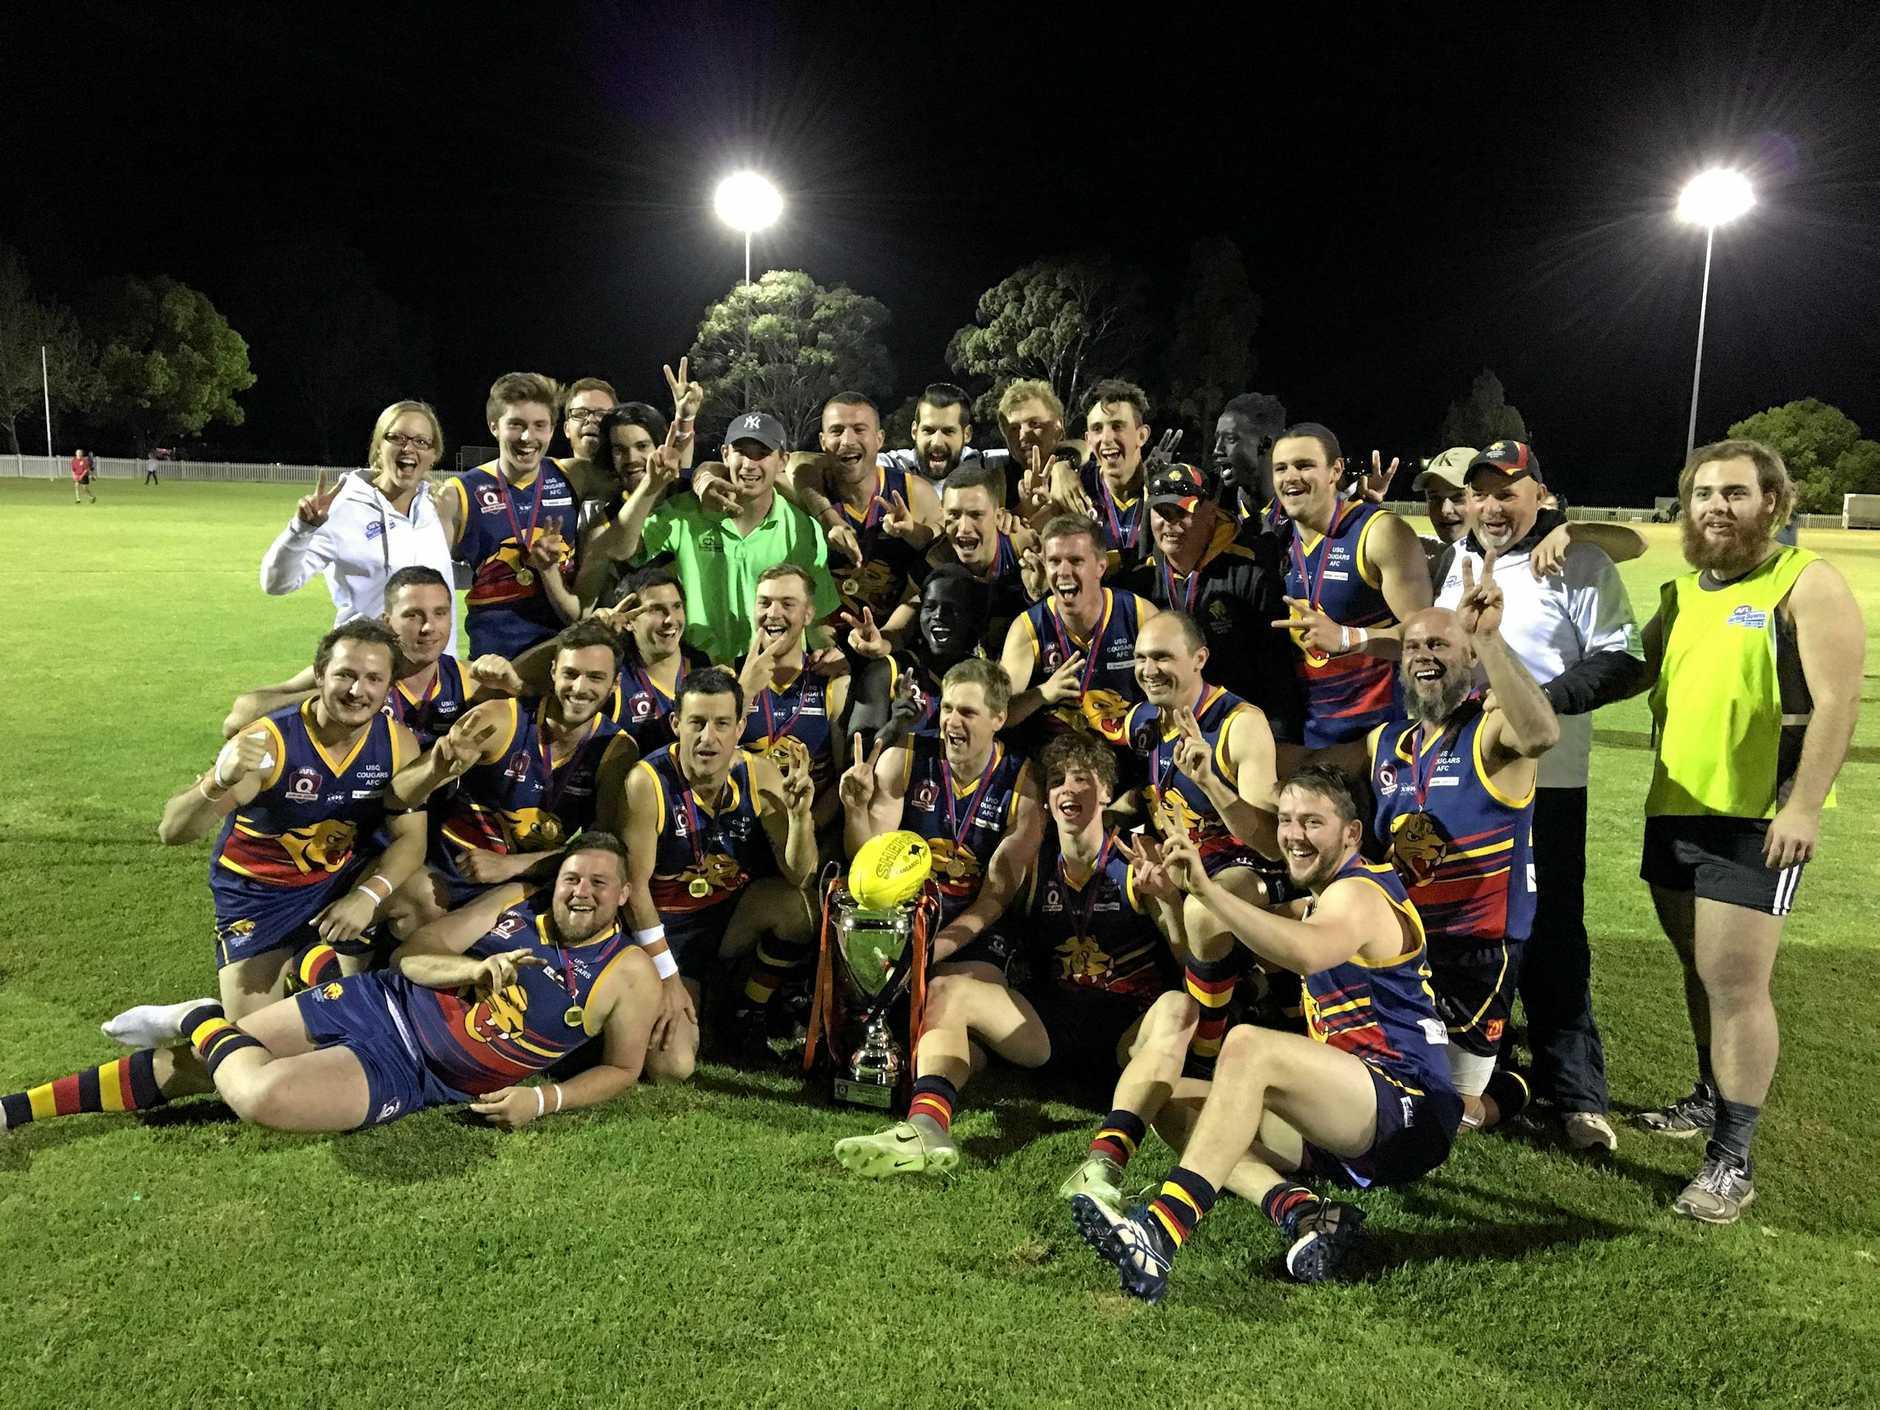 University celebrates winning the AFL Darling Downs grand final final over Goondiwindi at Rockville Park. Saturday, September 9, 2017